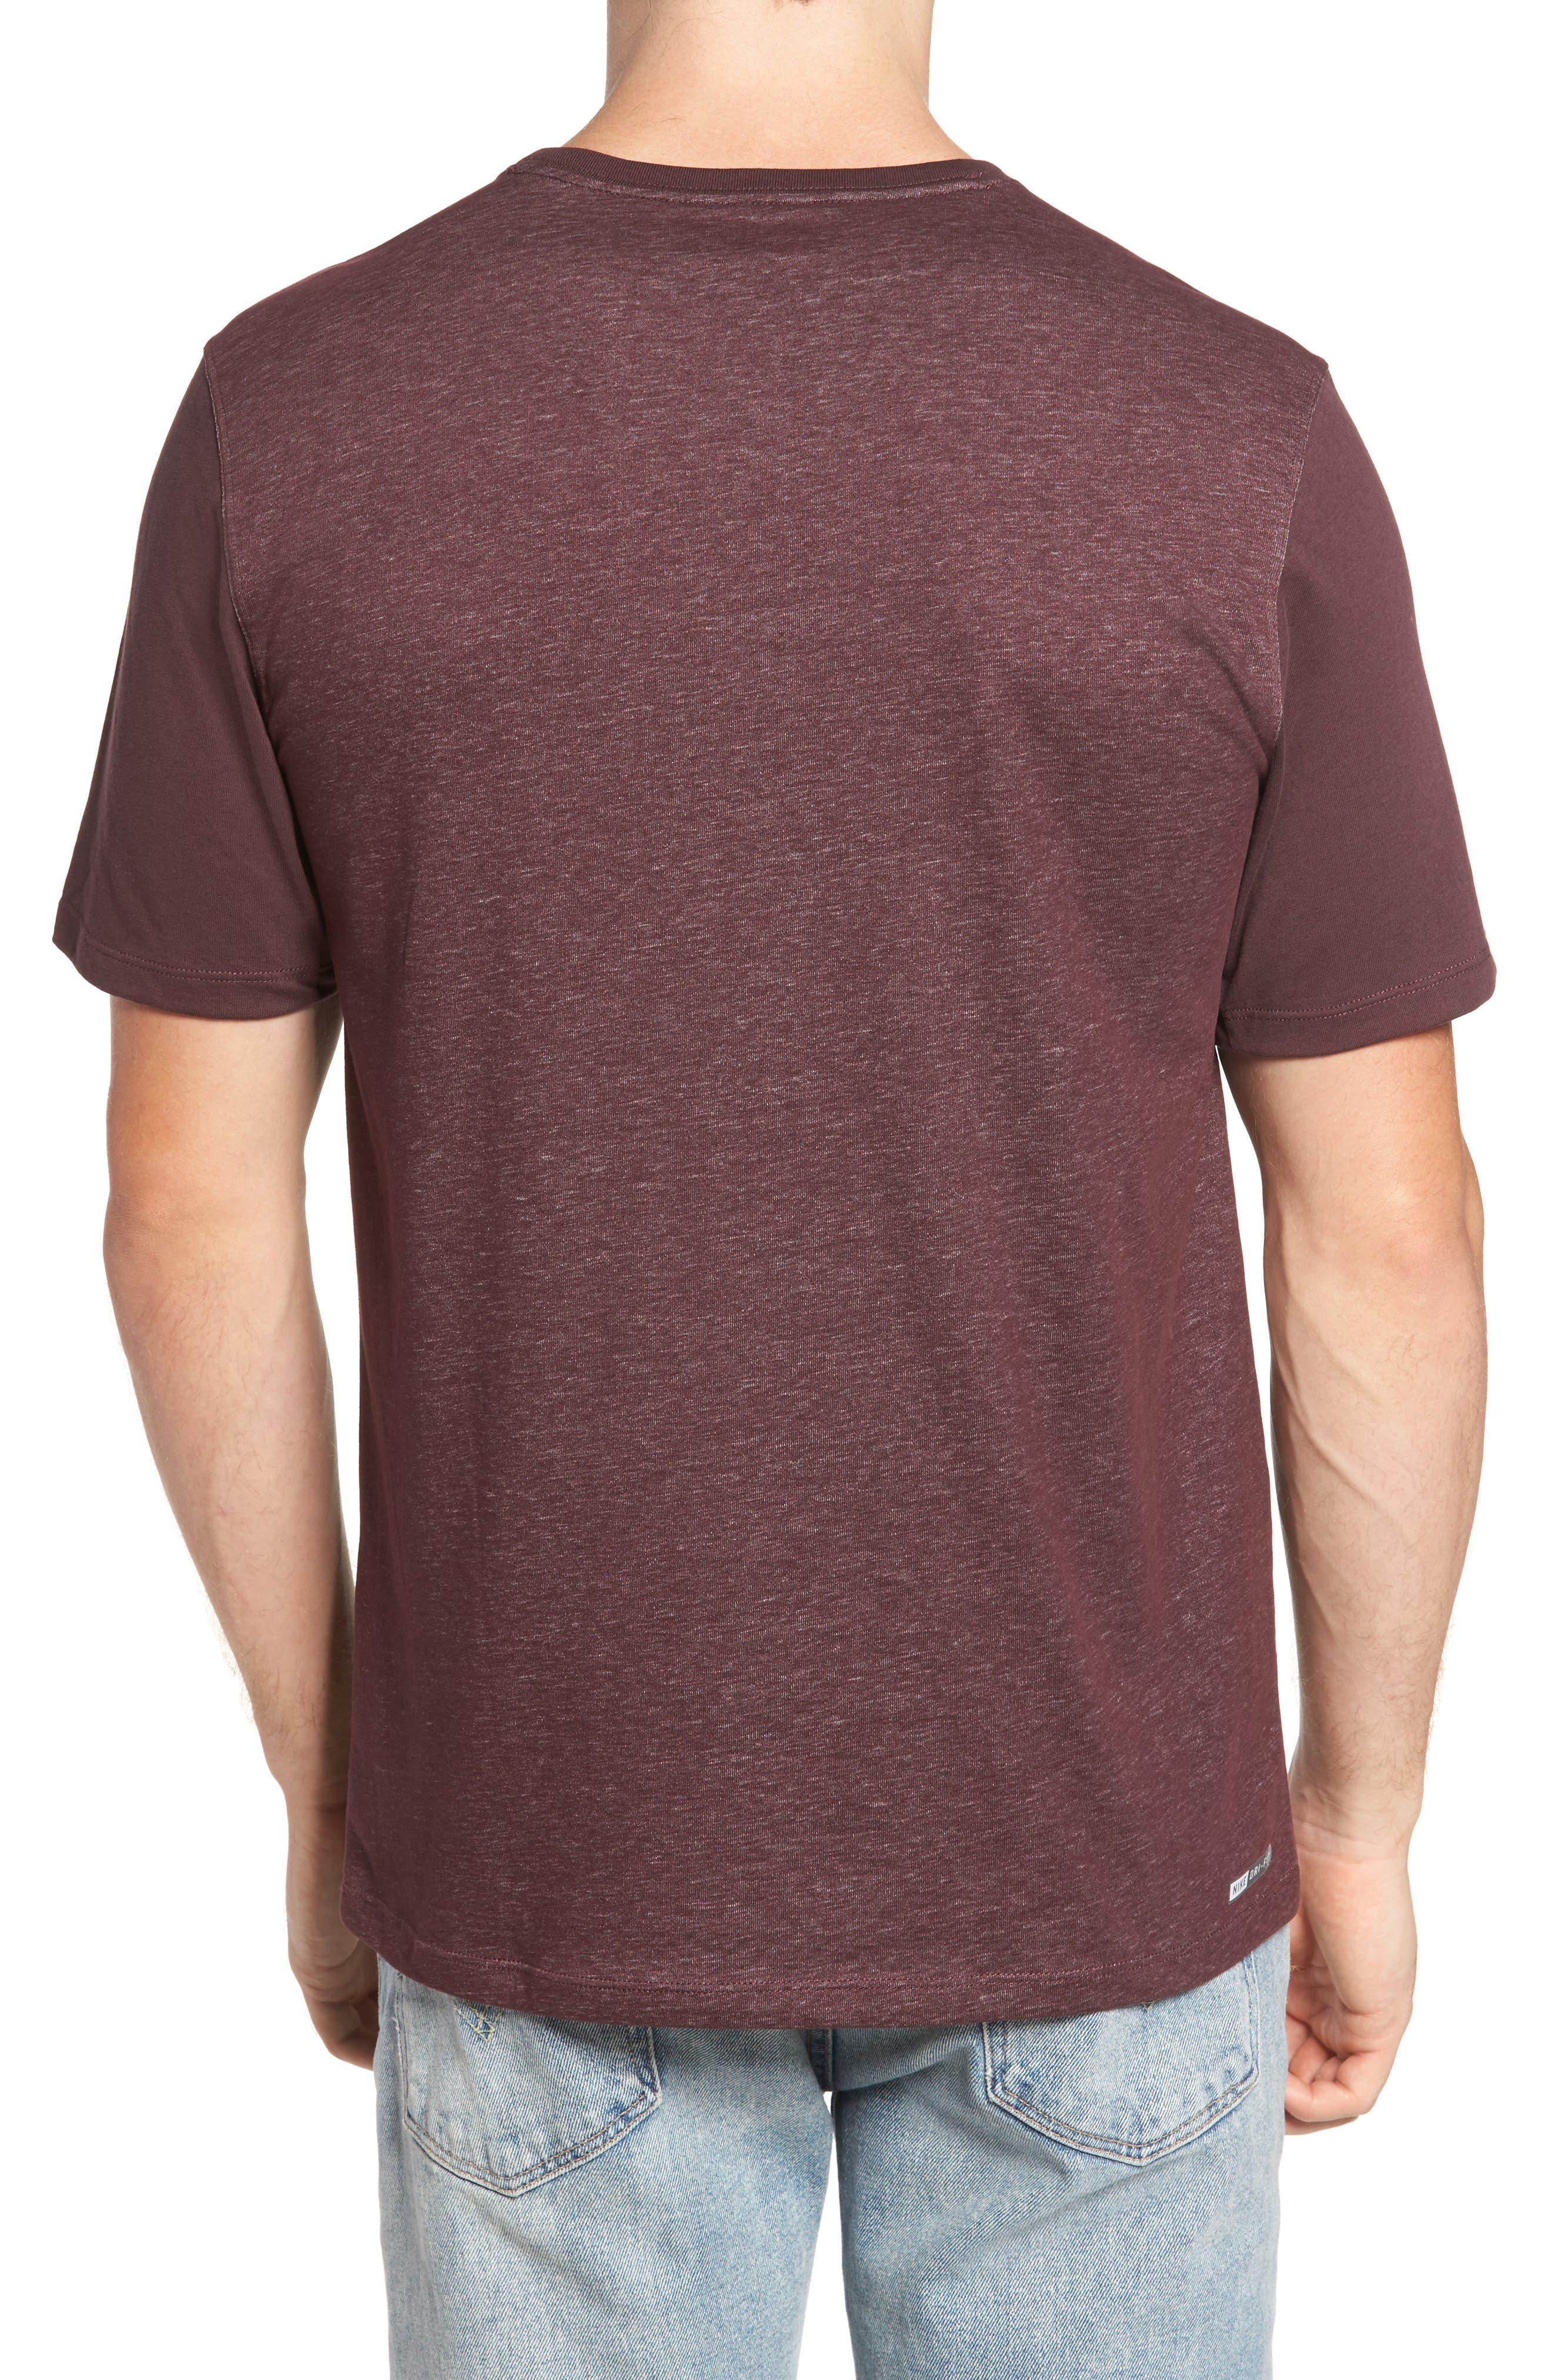 Alternate Image 2  - Hurley Lagos Snapper Dri-FIT T-Shirt